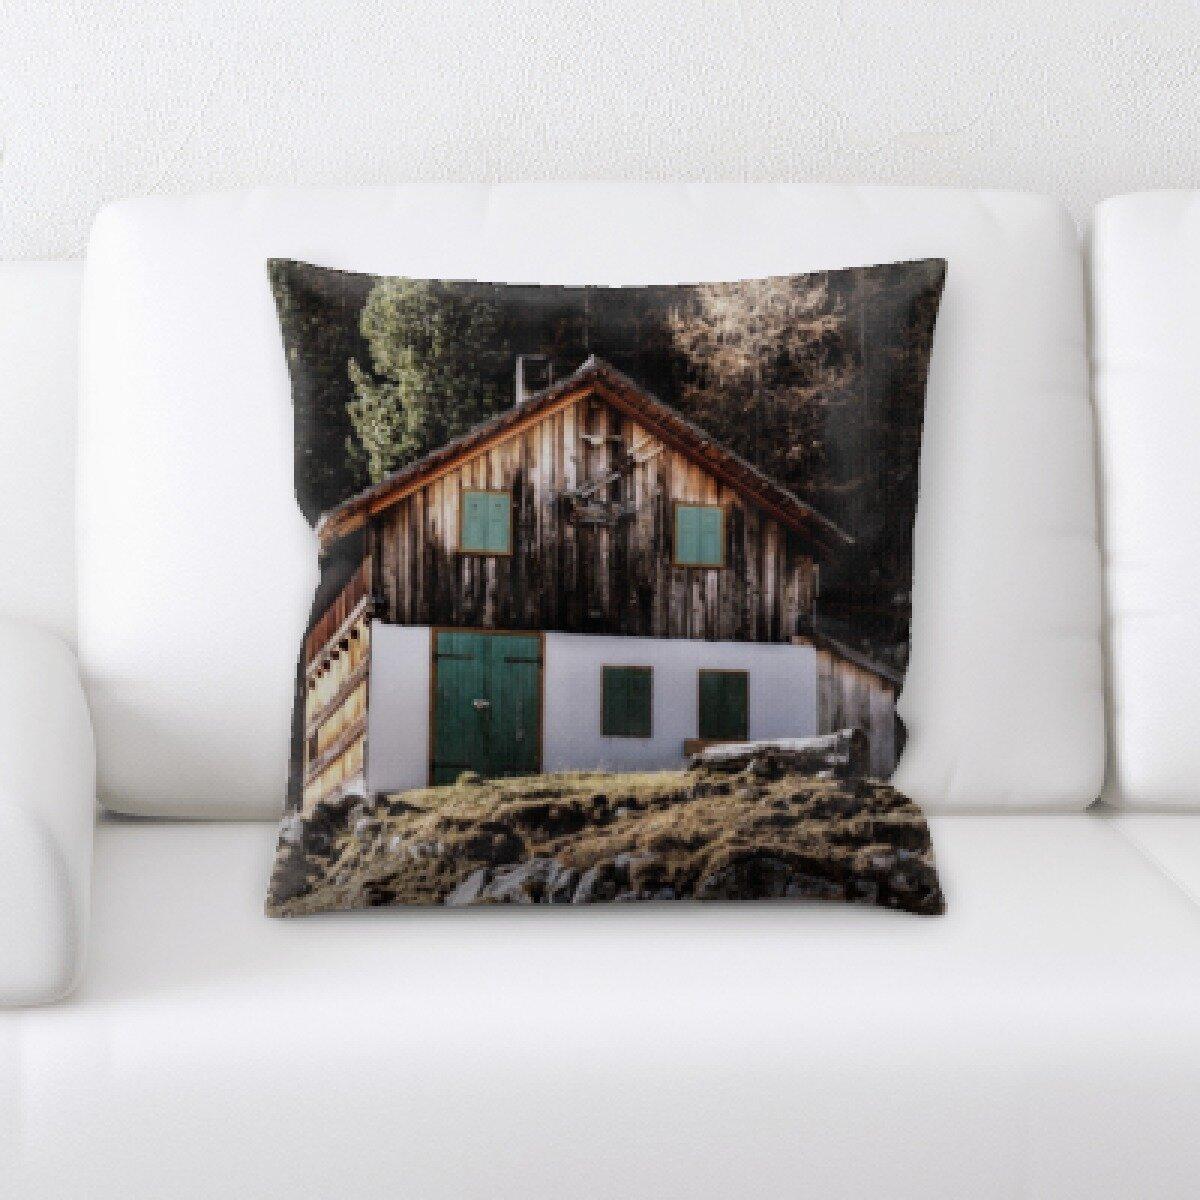 Green Rustic Throw Pillows You Ll Love In 2021 Wayfair